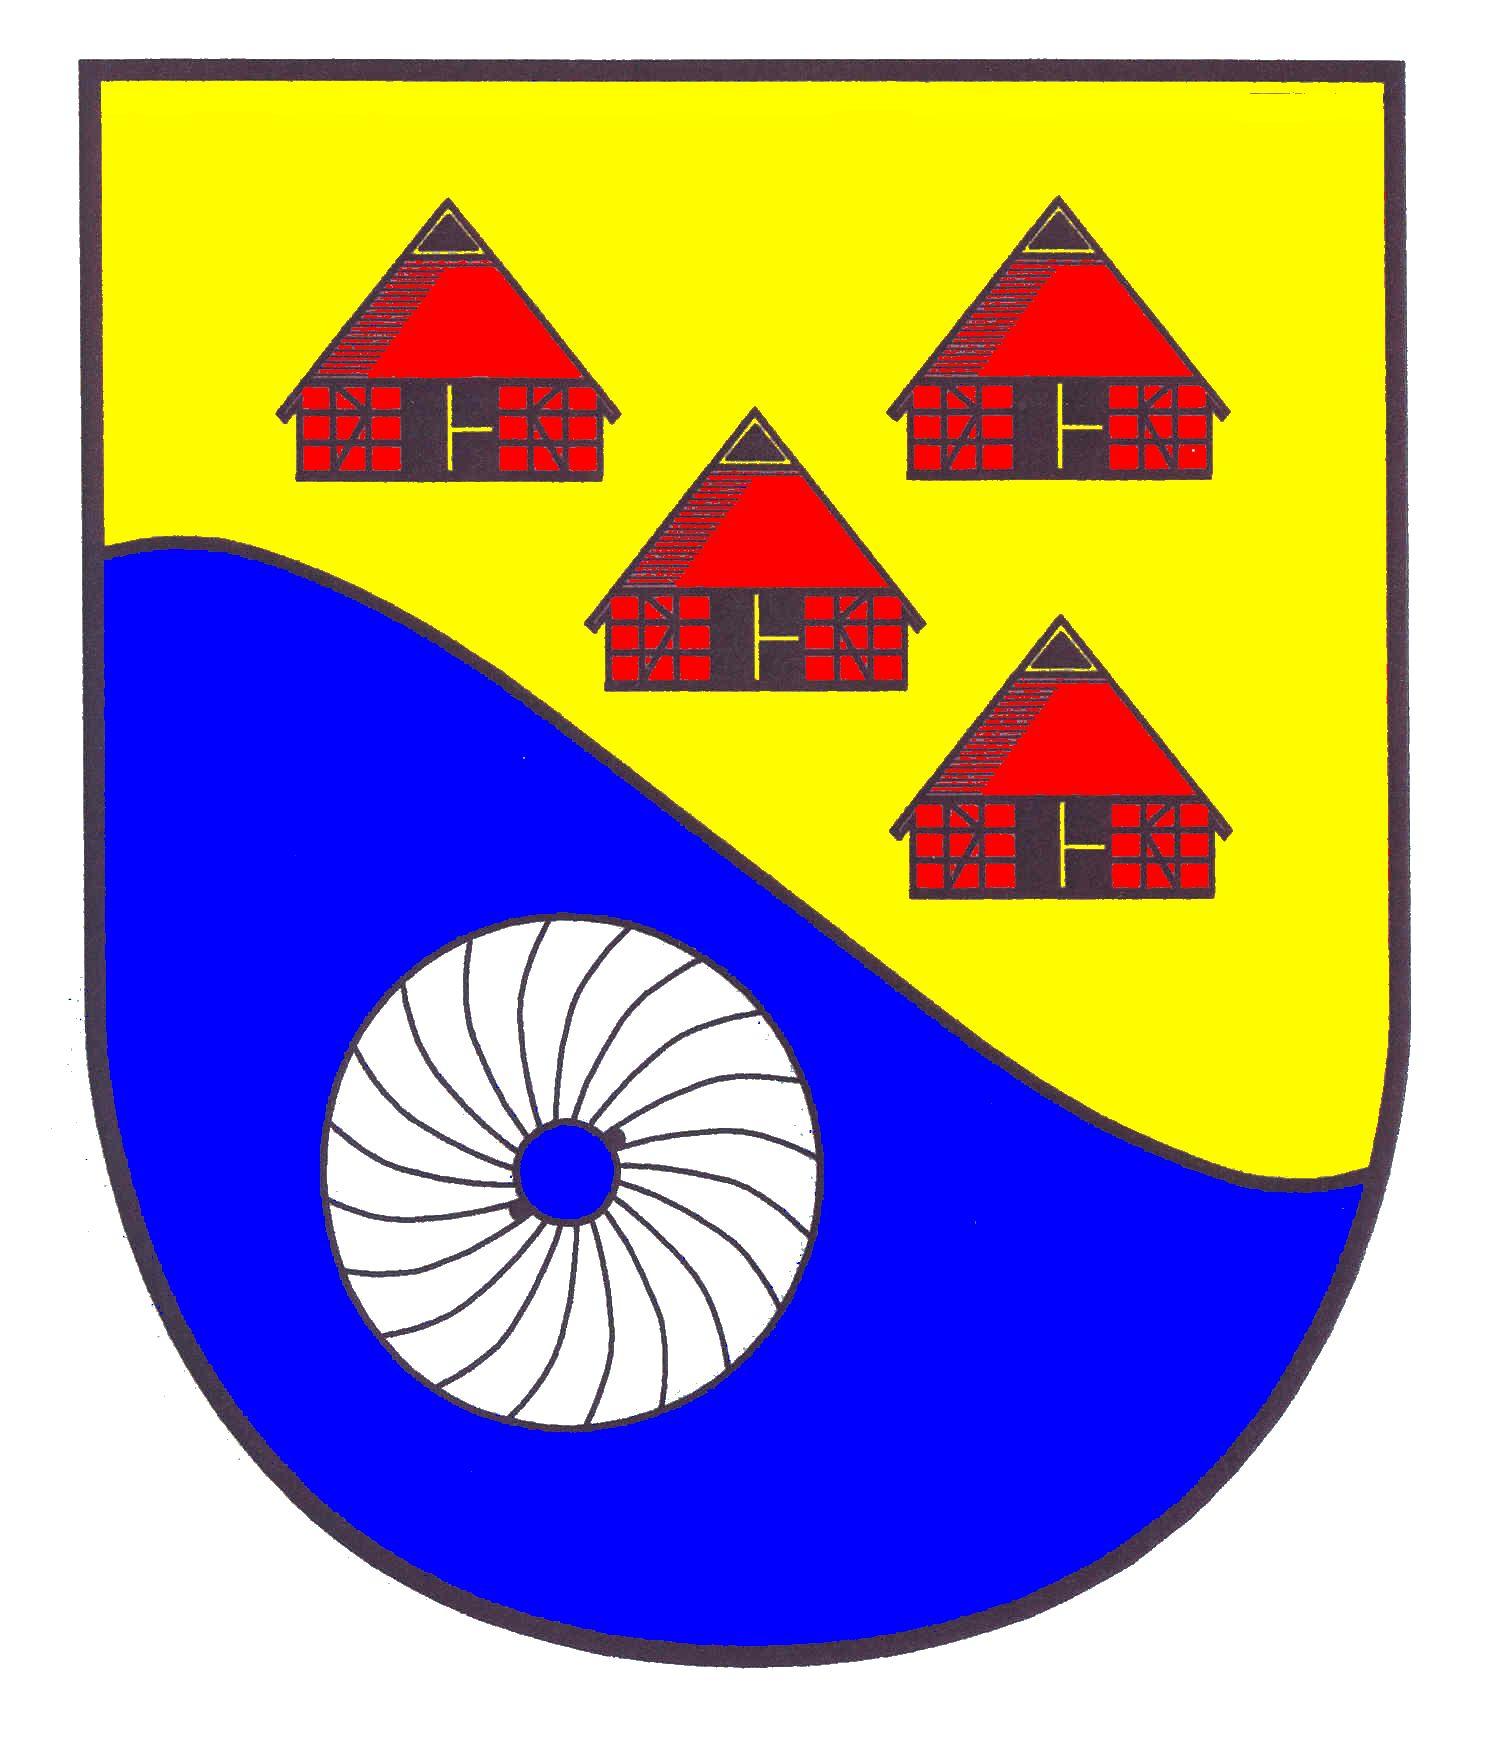 Wappen GemeindeWeddelbrook, Kreis Segeberg